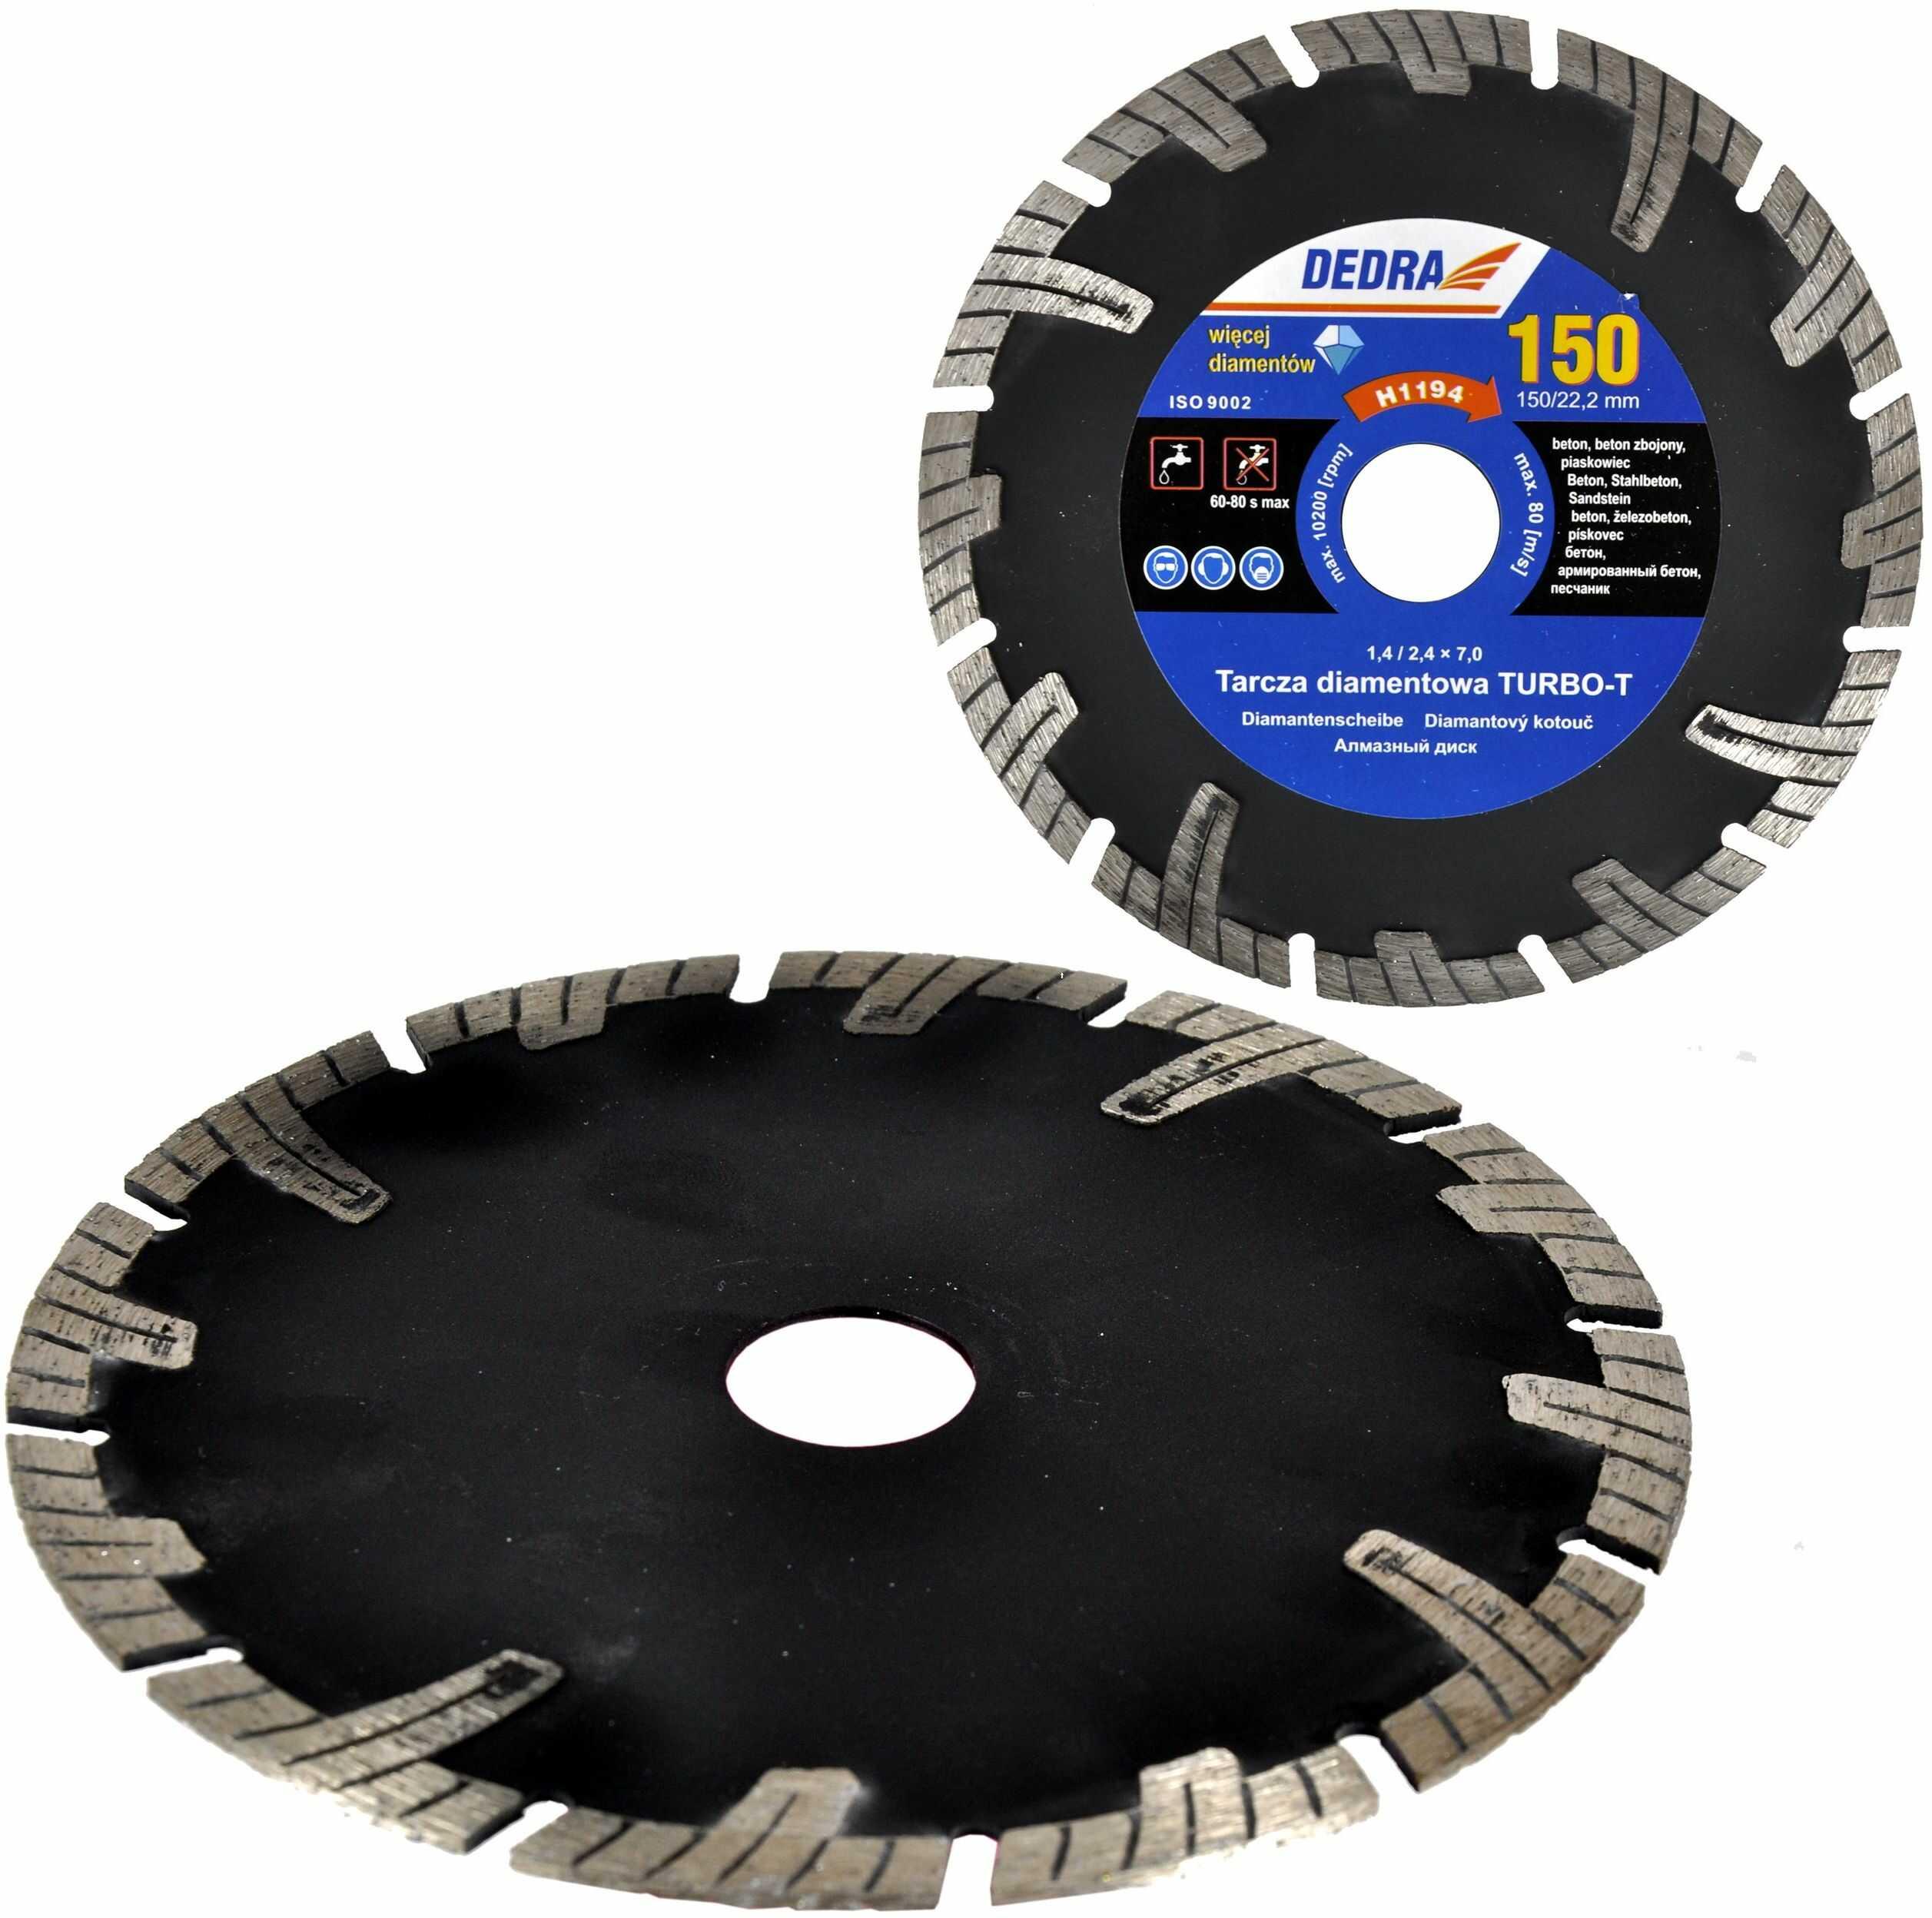 Piła tarczowa tarcza diamentowa 180mm 22,2 betonu